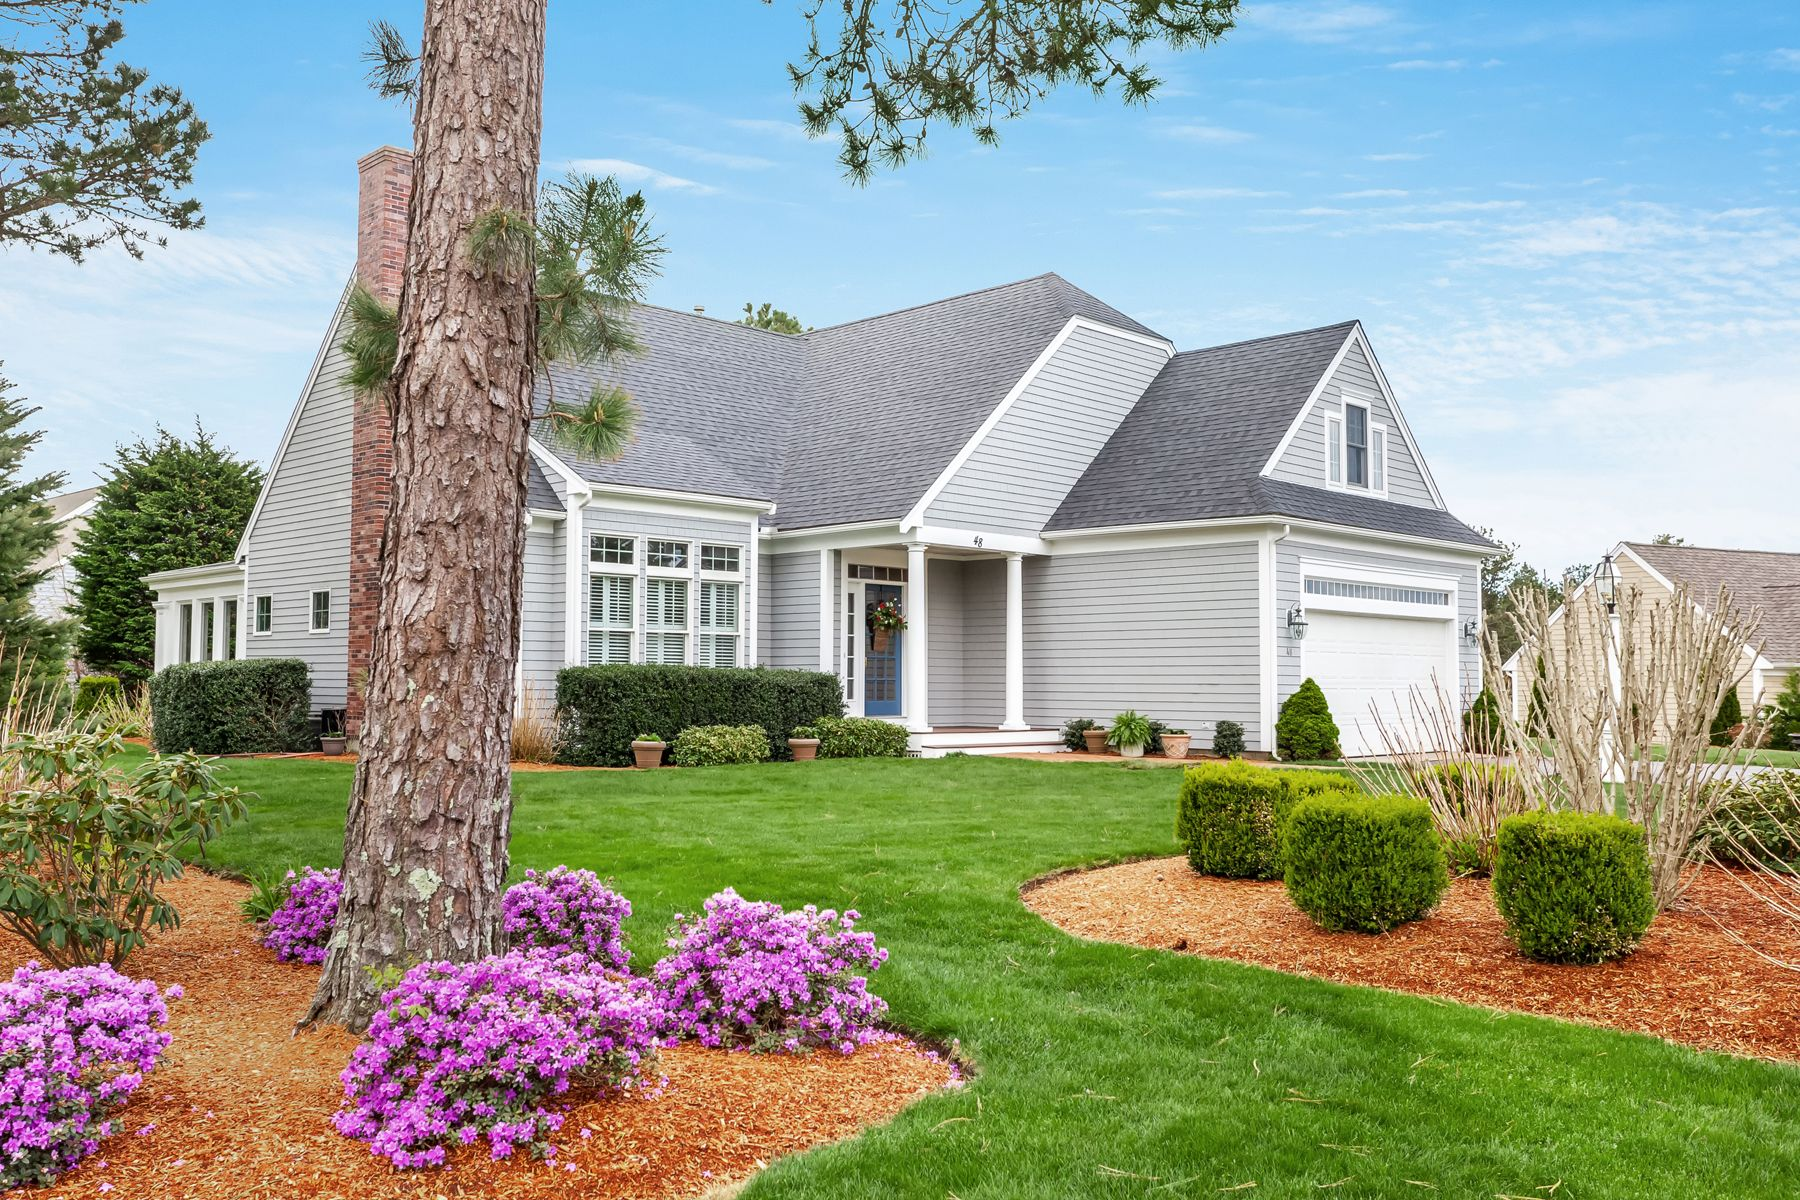 Single Family Homes for Active at 48 Taurus Drive Mashpee, Massachusetts 02649 United States